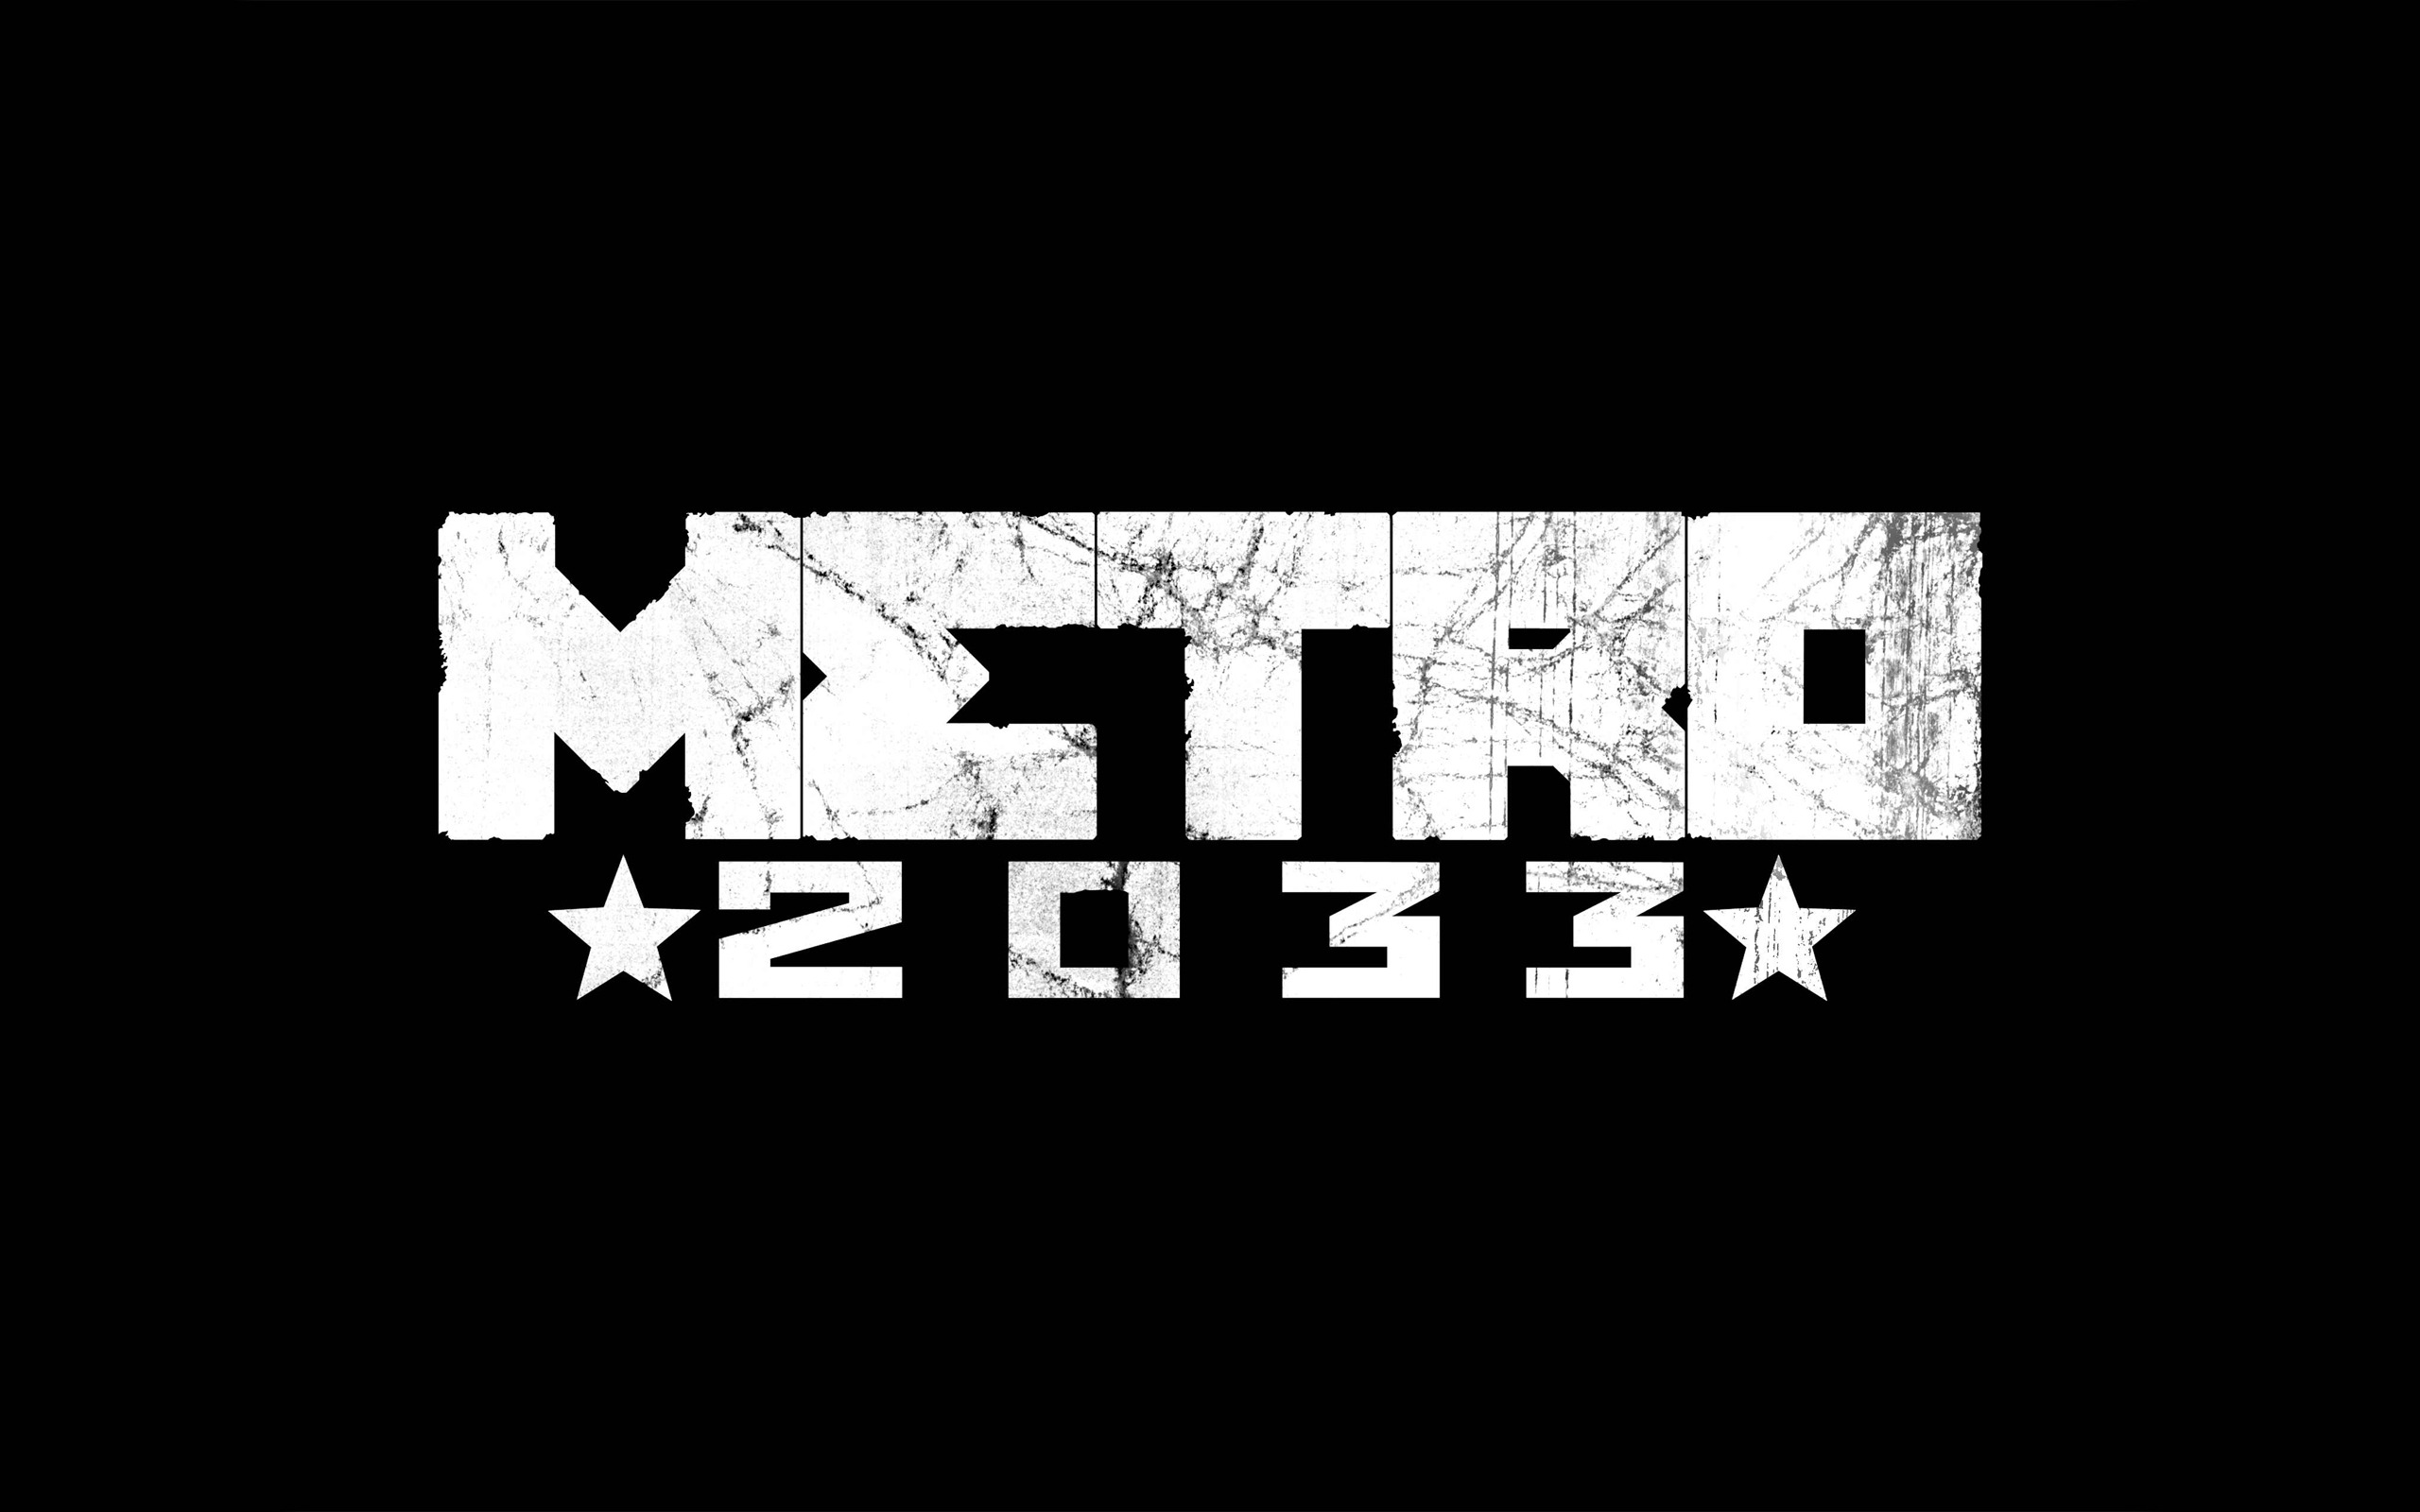 metro 2033 logo 31112